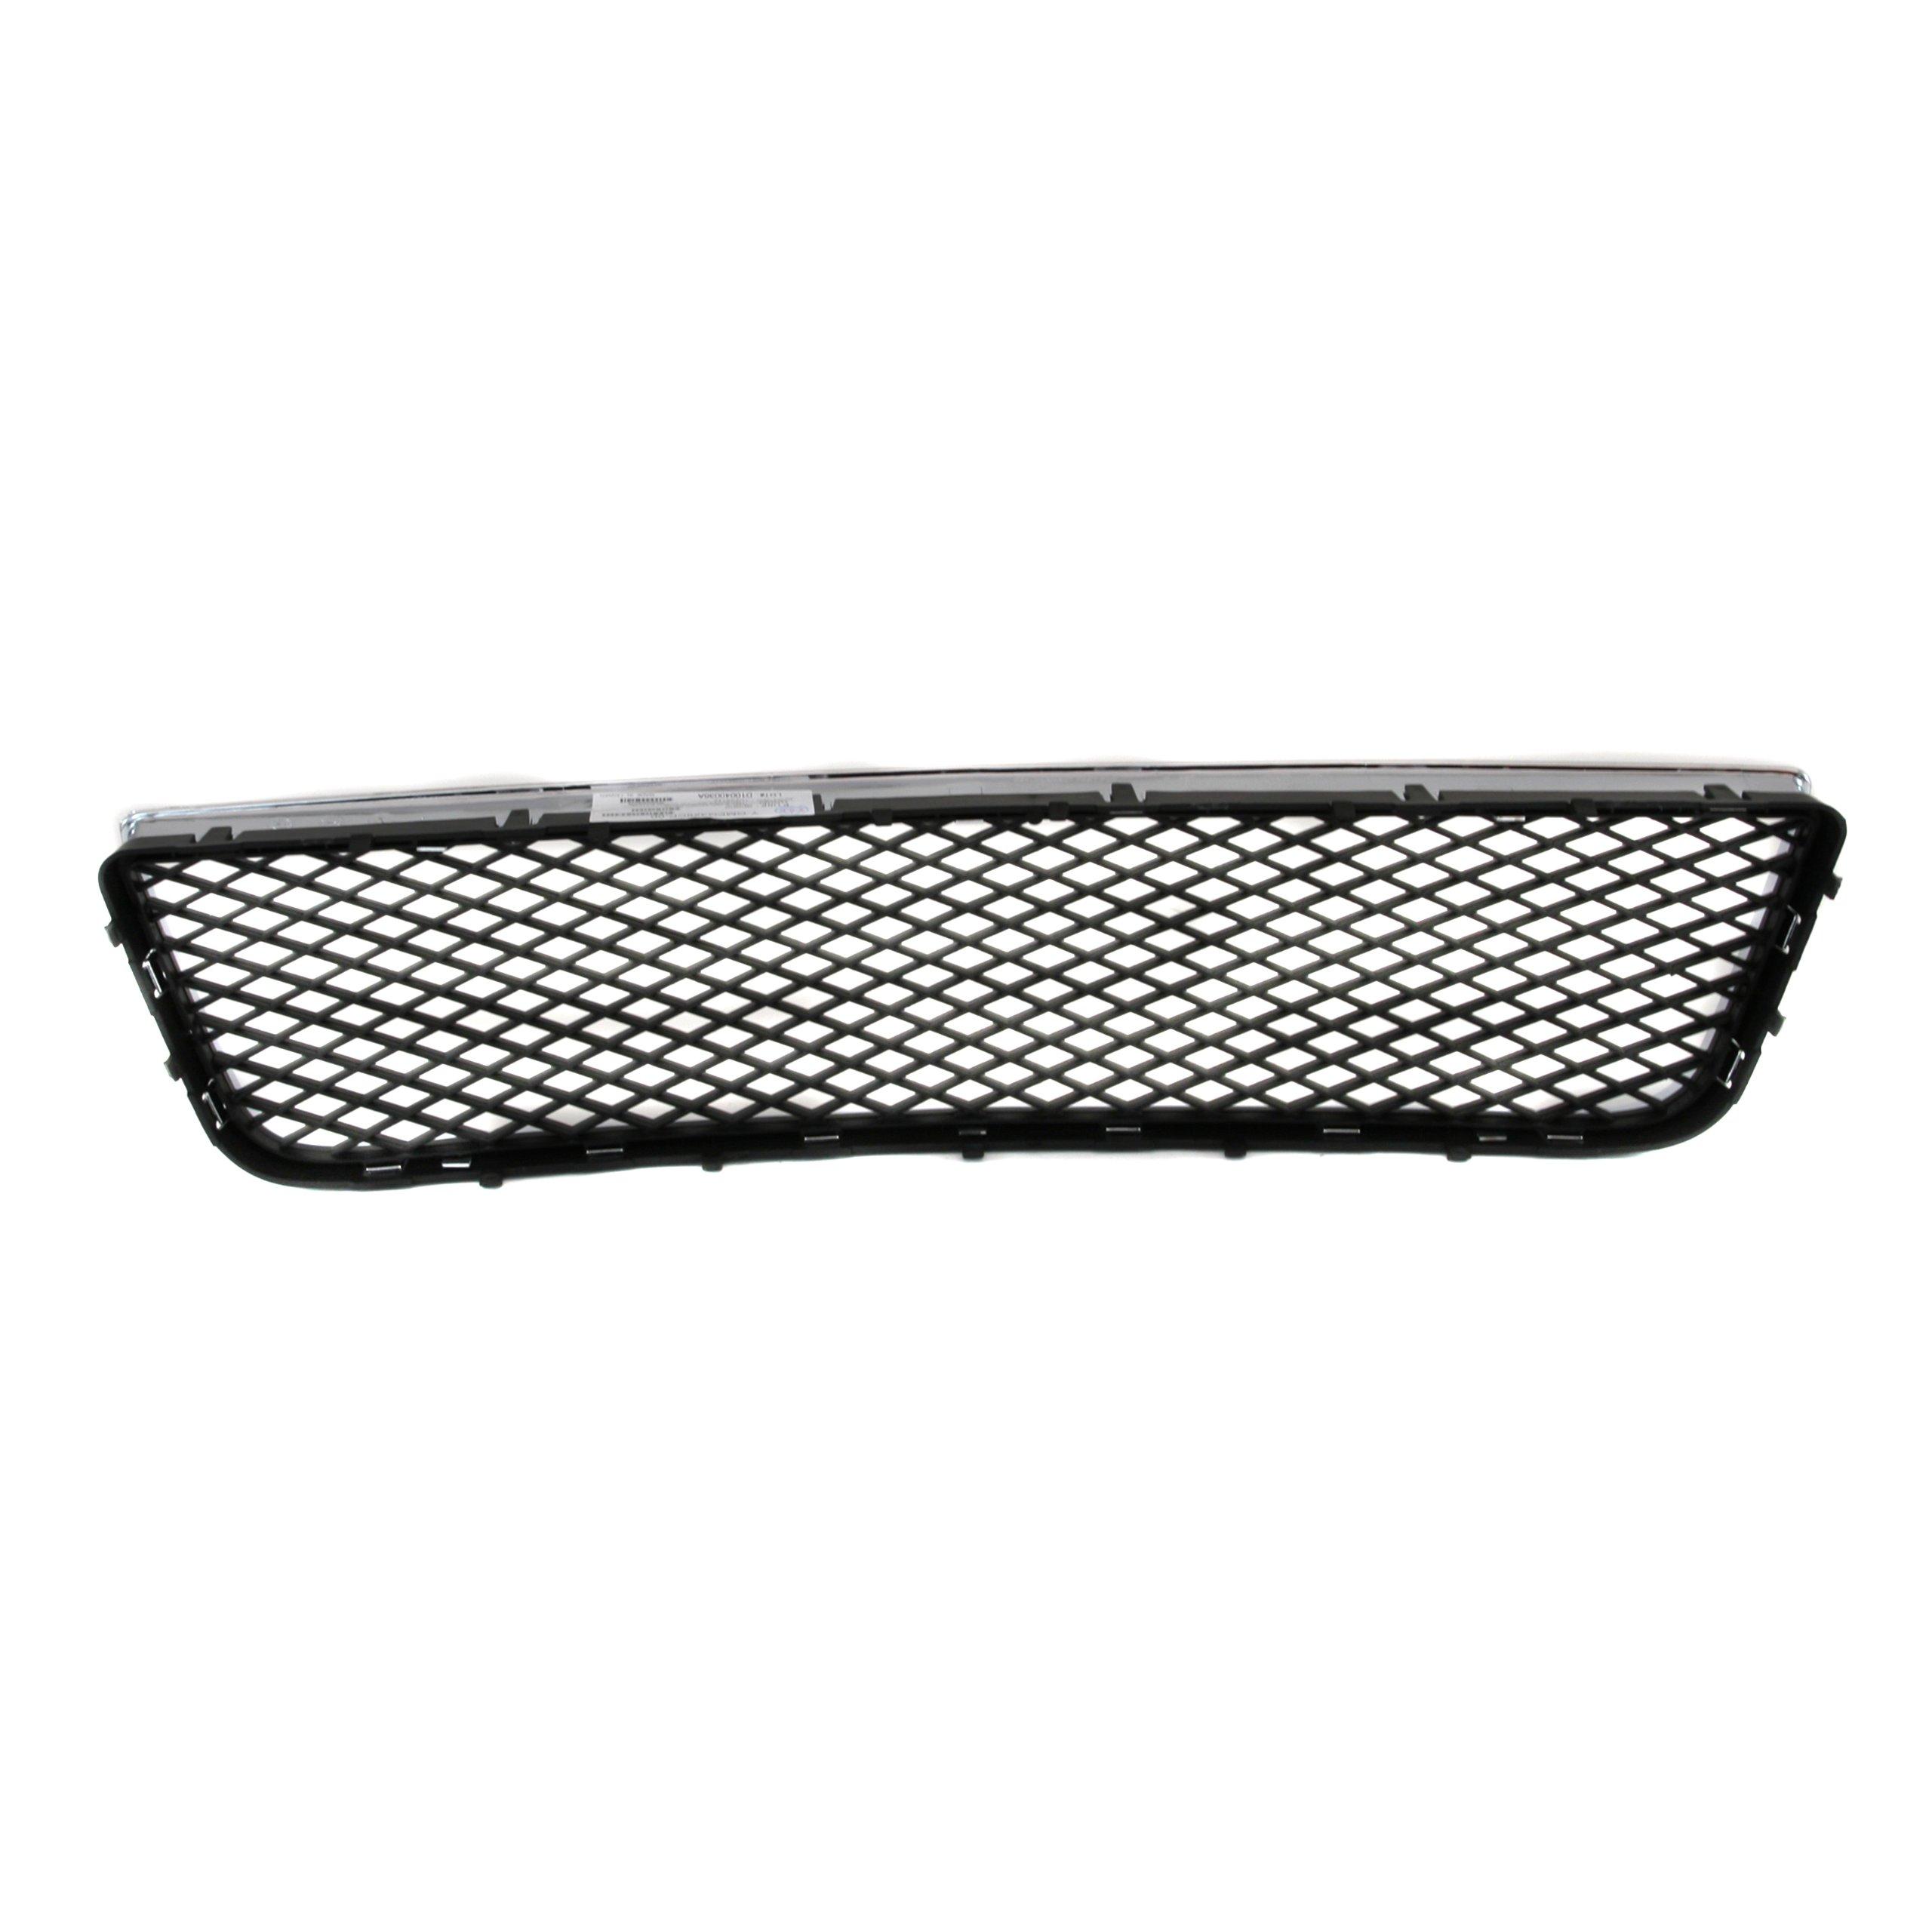 CarPartsDepot, Front Bumper Lower Matte Black Mesh Grille Chrome Trim Frame, 363-15104 GM1036107 10333712 by CarPartsDepot (Image #1)